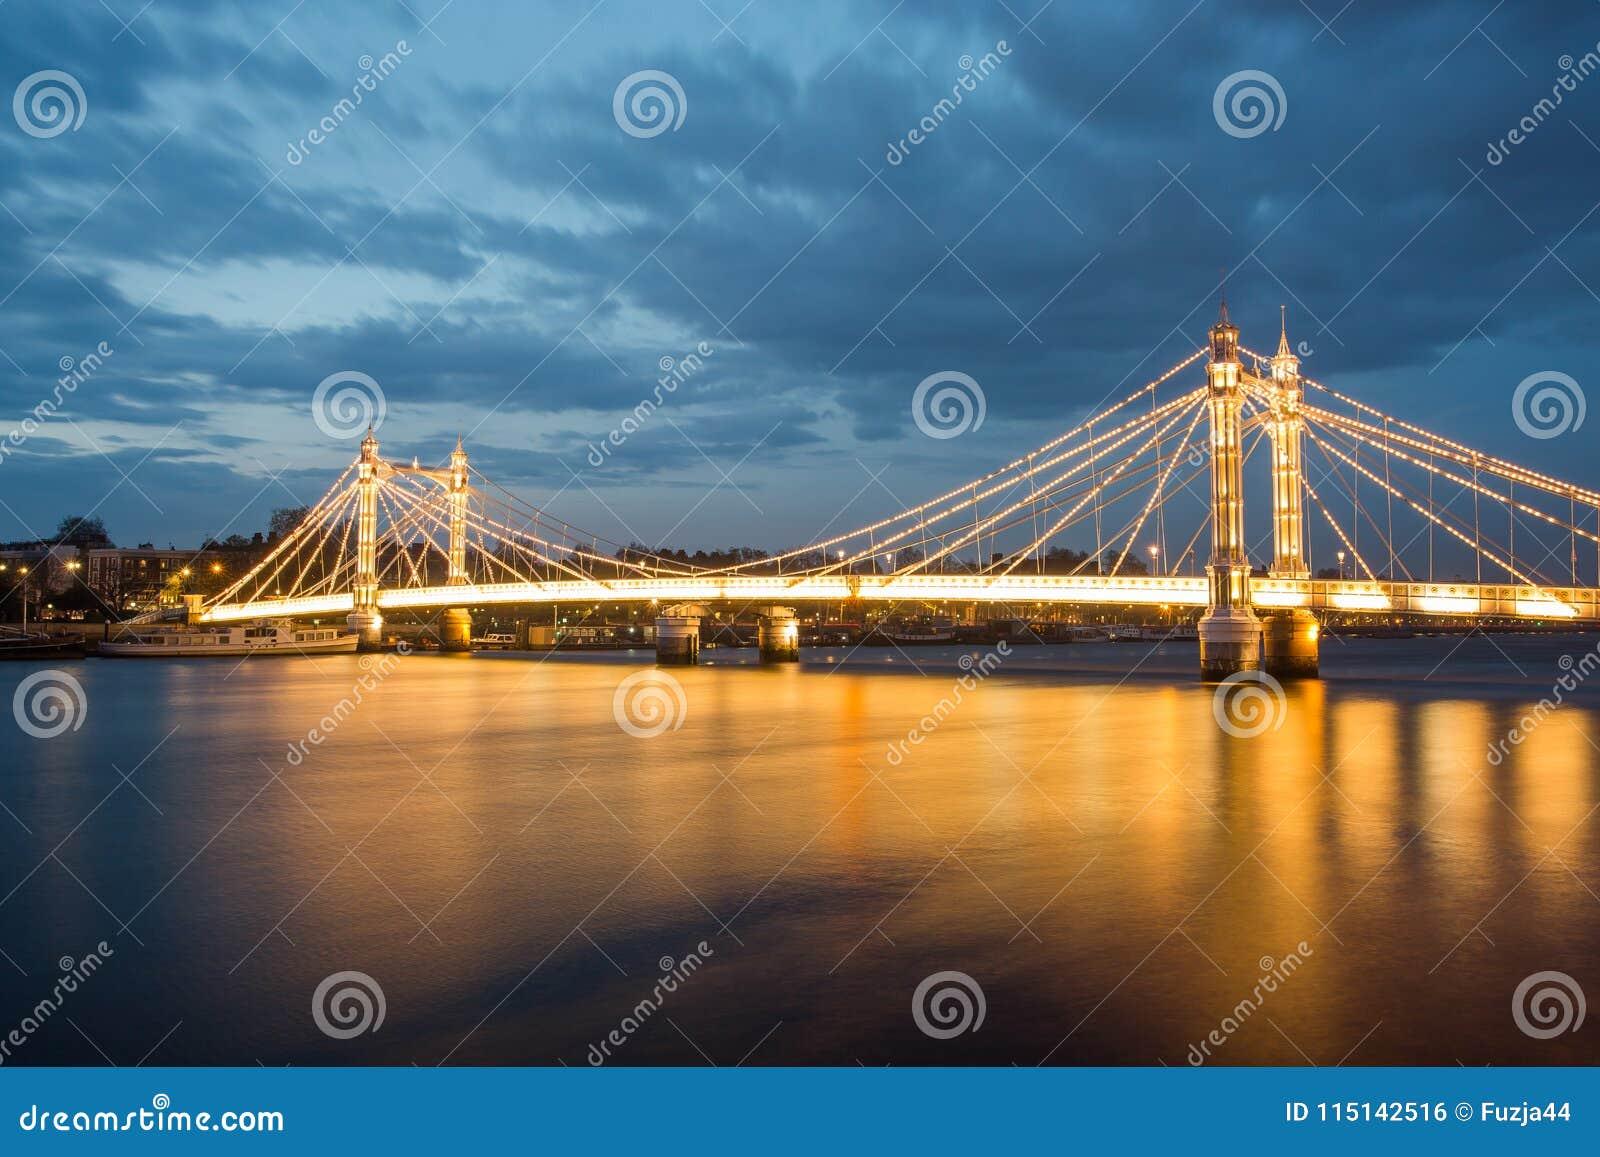 Albert Bridge and beautiful sunset over the Thames, London England UK